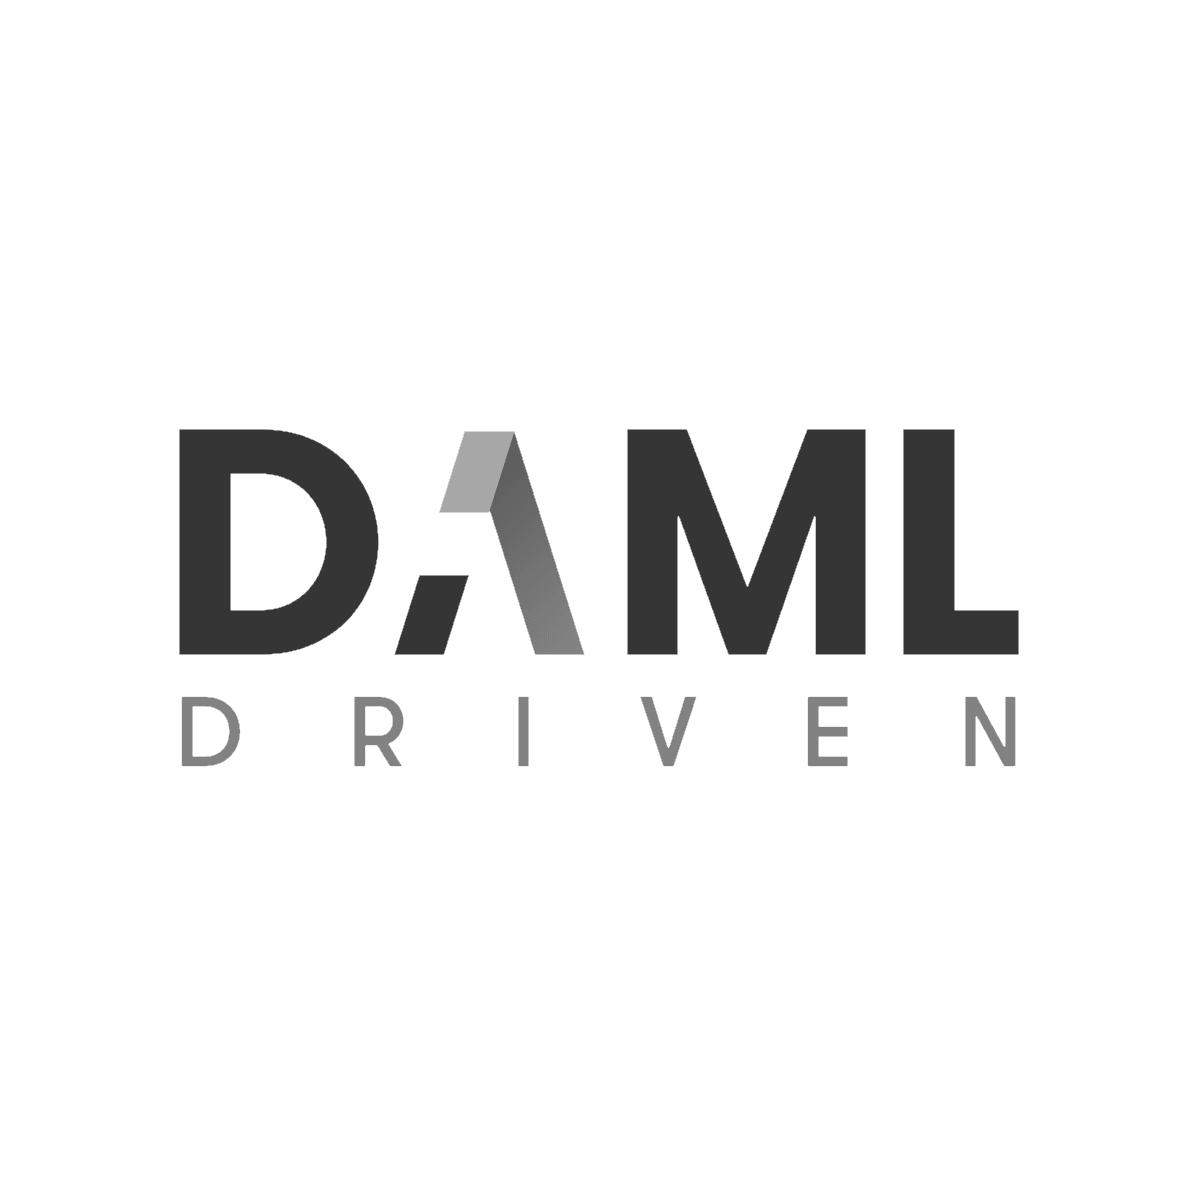 DAML-driven-bw.png